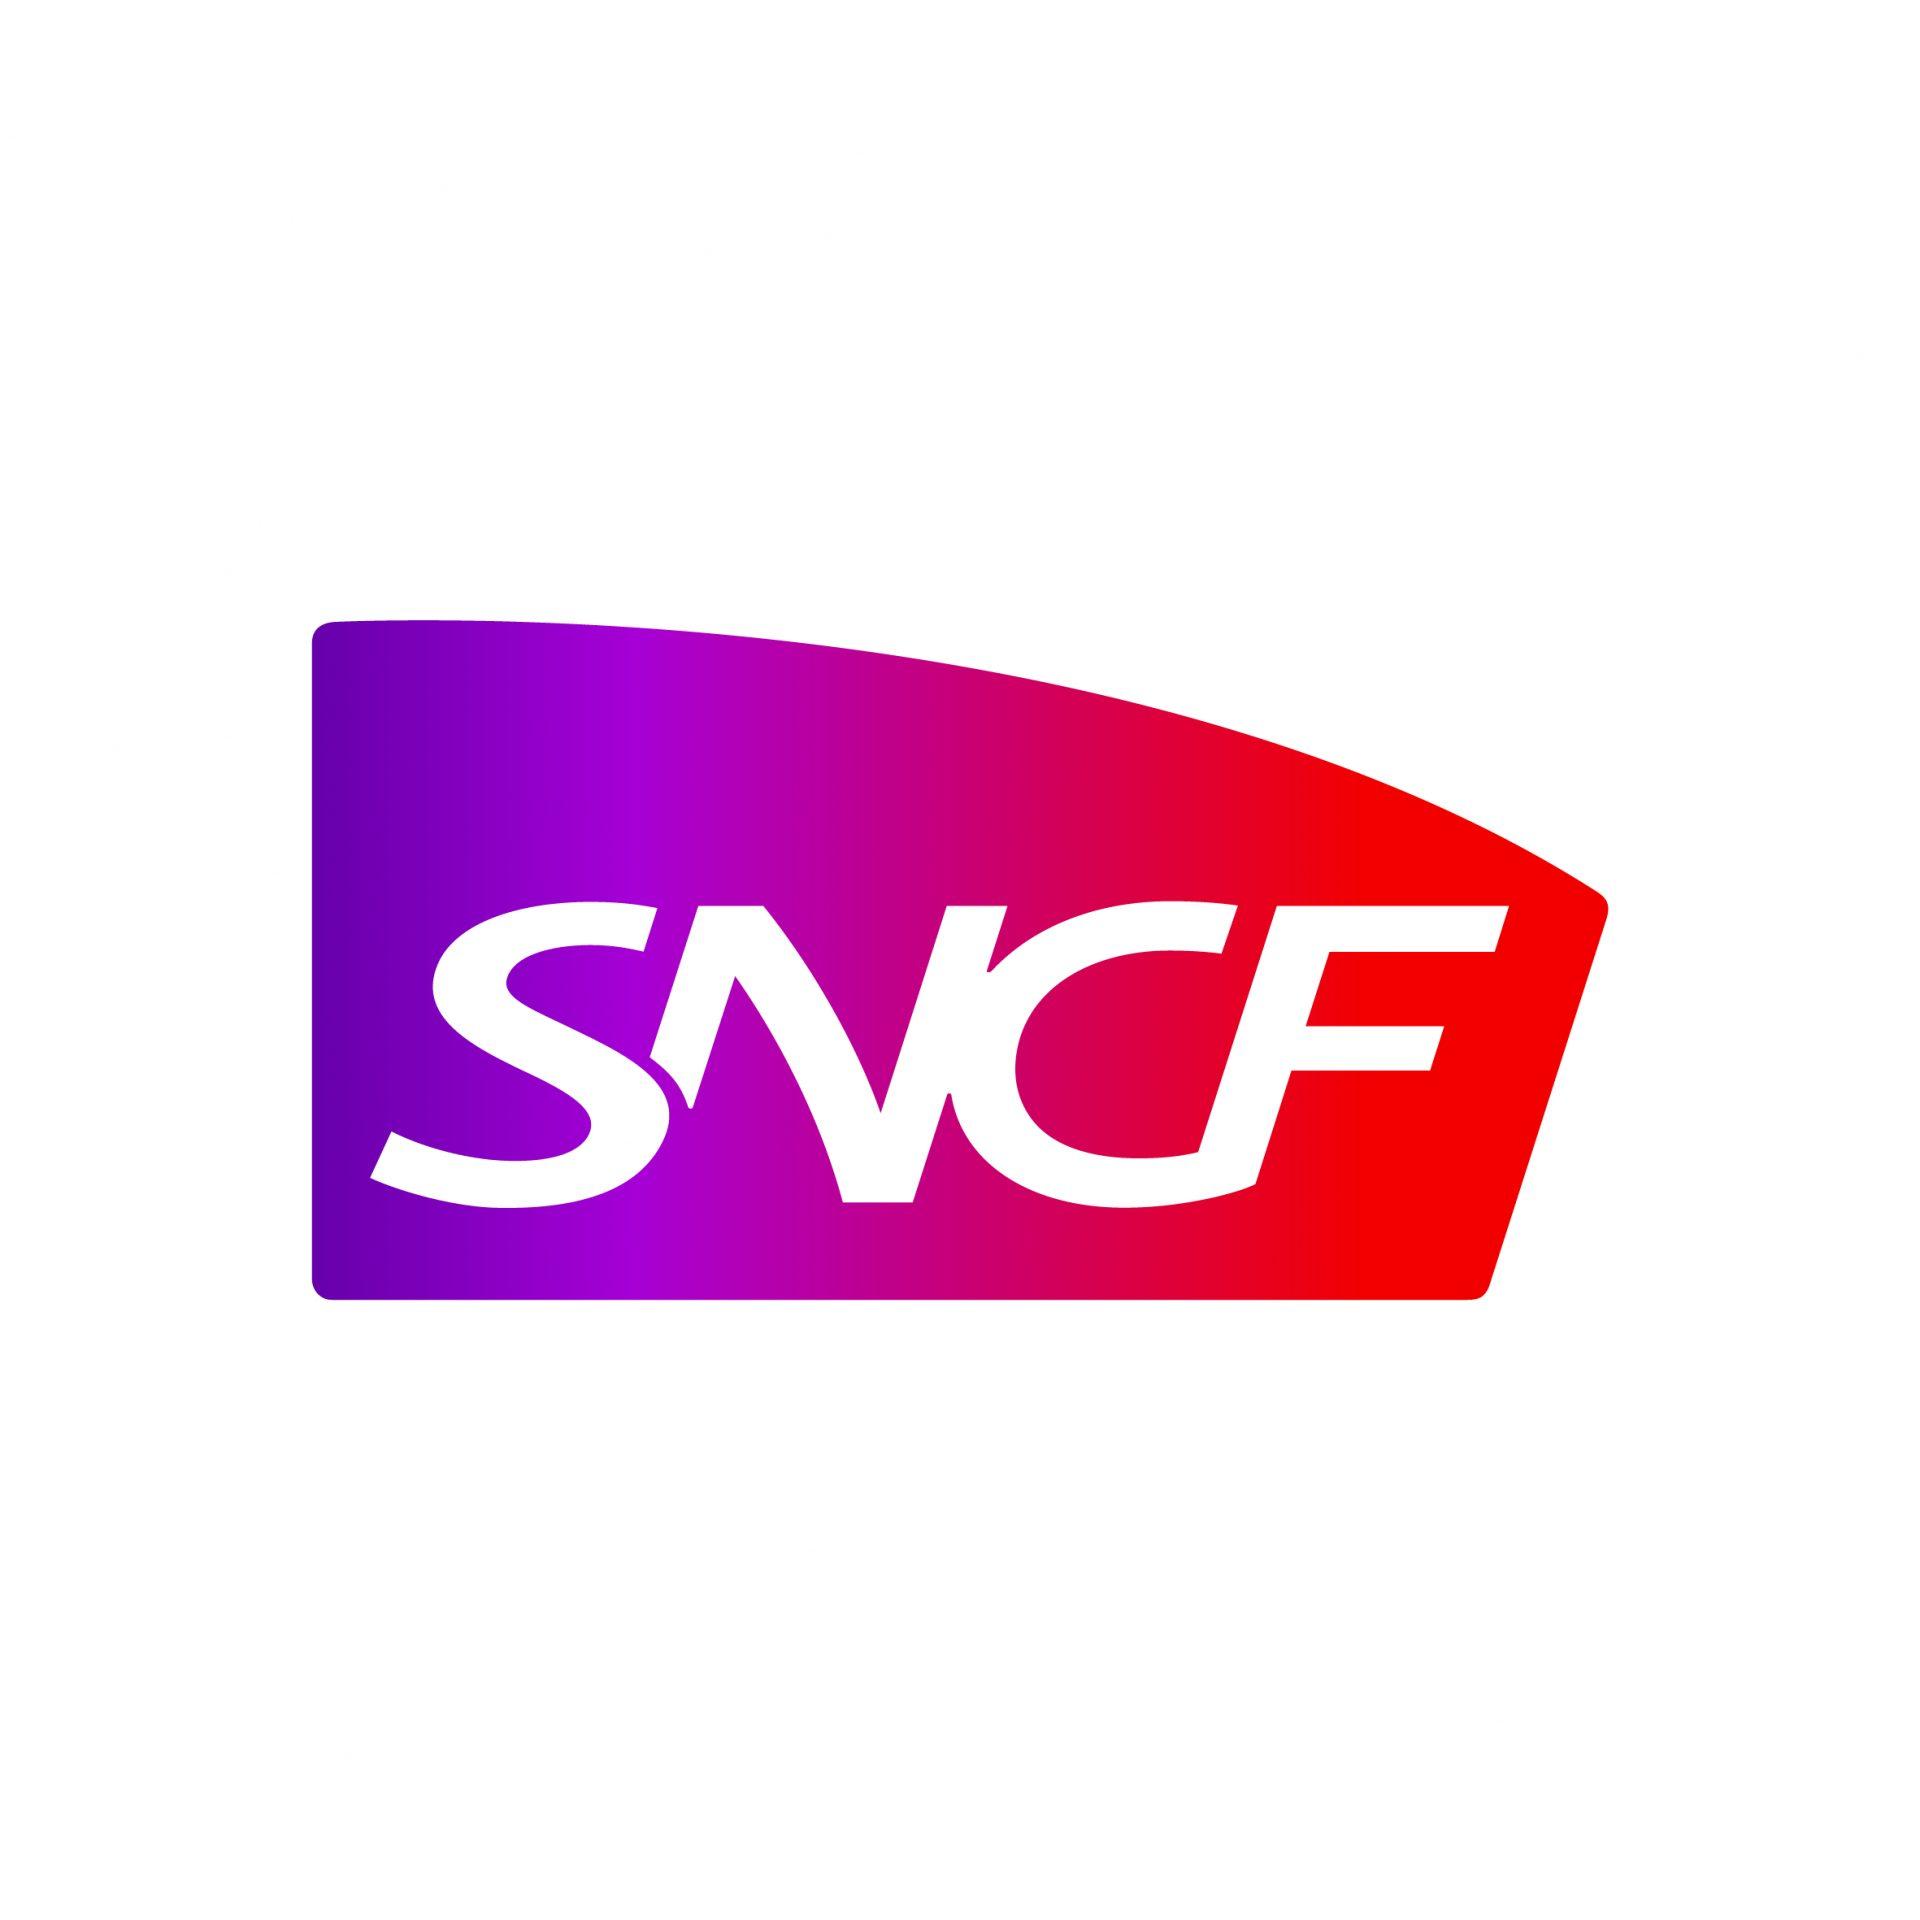 06_NOS CLIENTS_LOGO_SNCF_GROUPE_CMJN